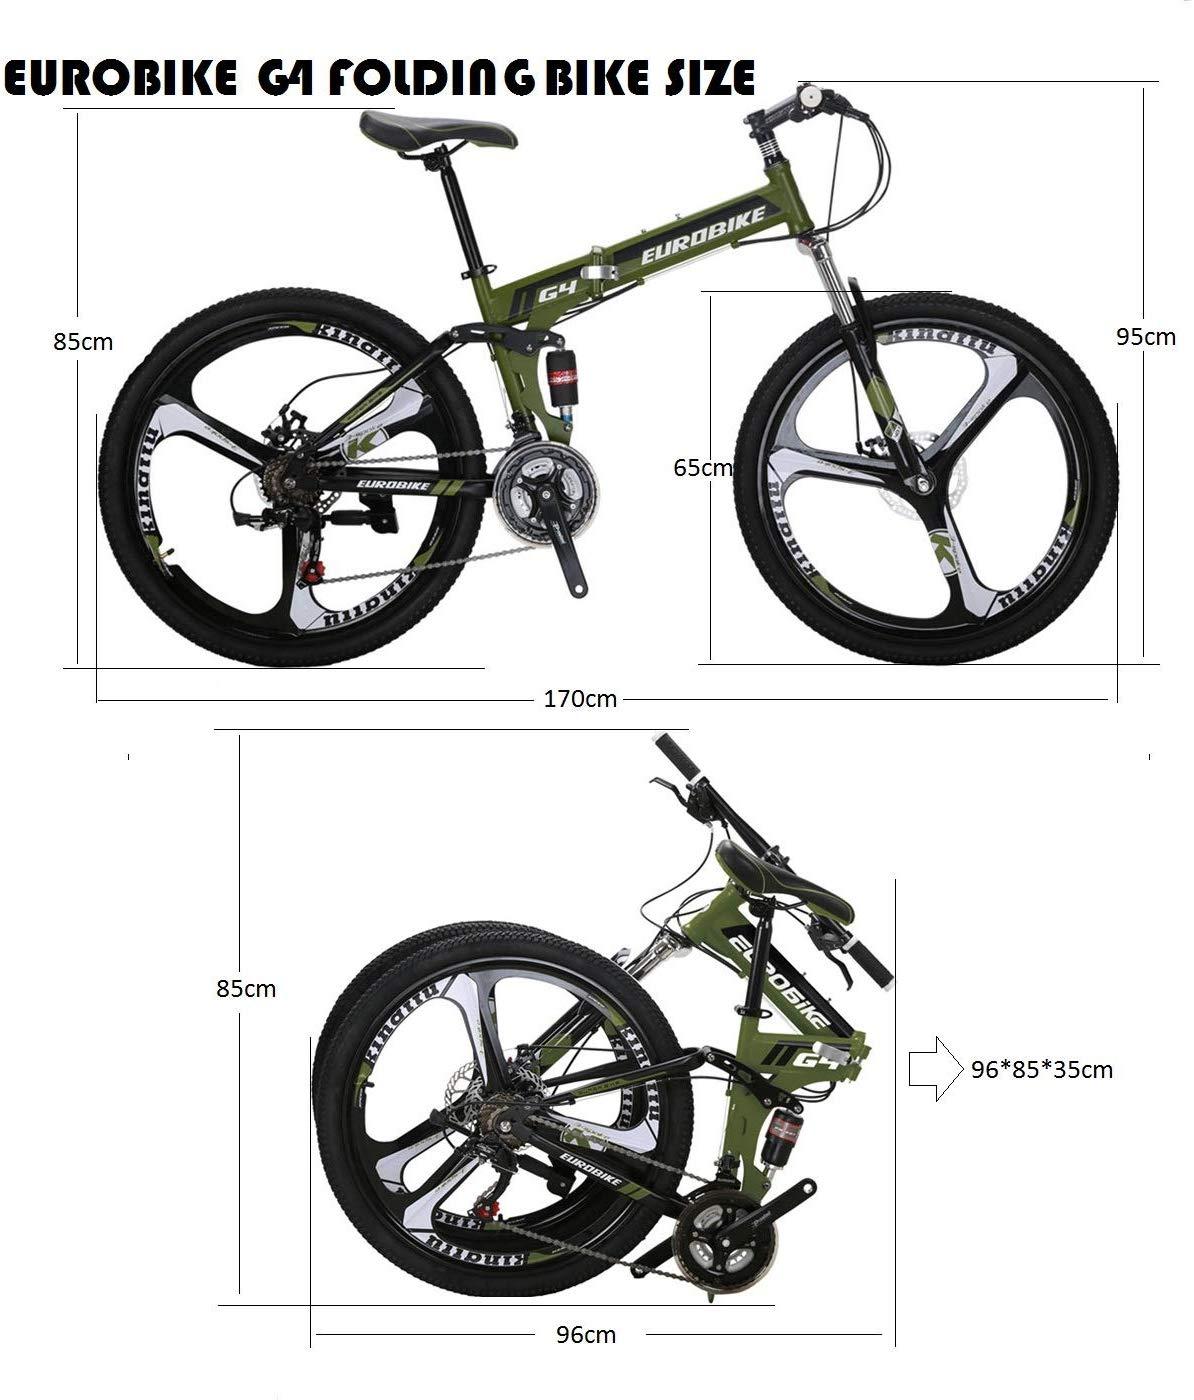 Public Faux Leather Ergo Grips Black for Grip//Twist Shifters Hybrid Bike